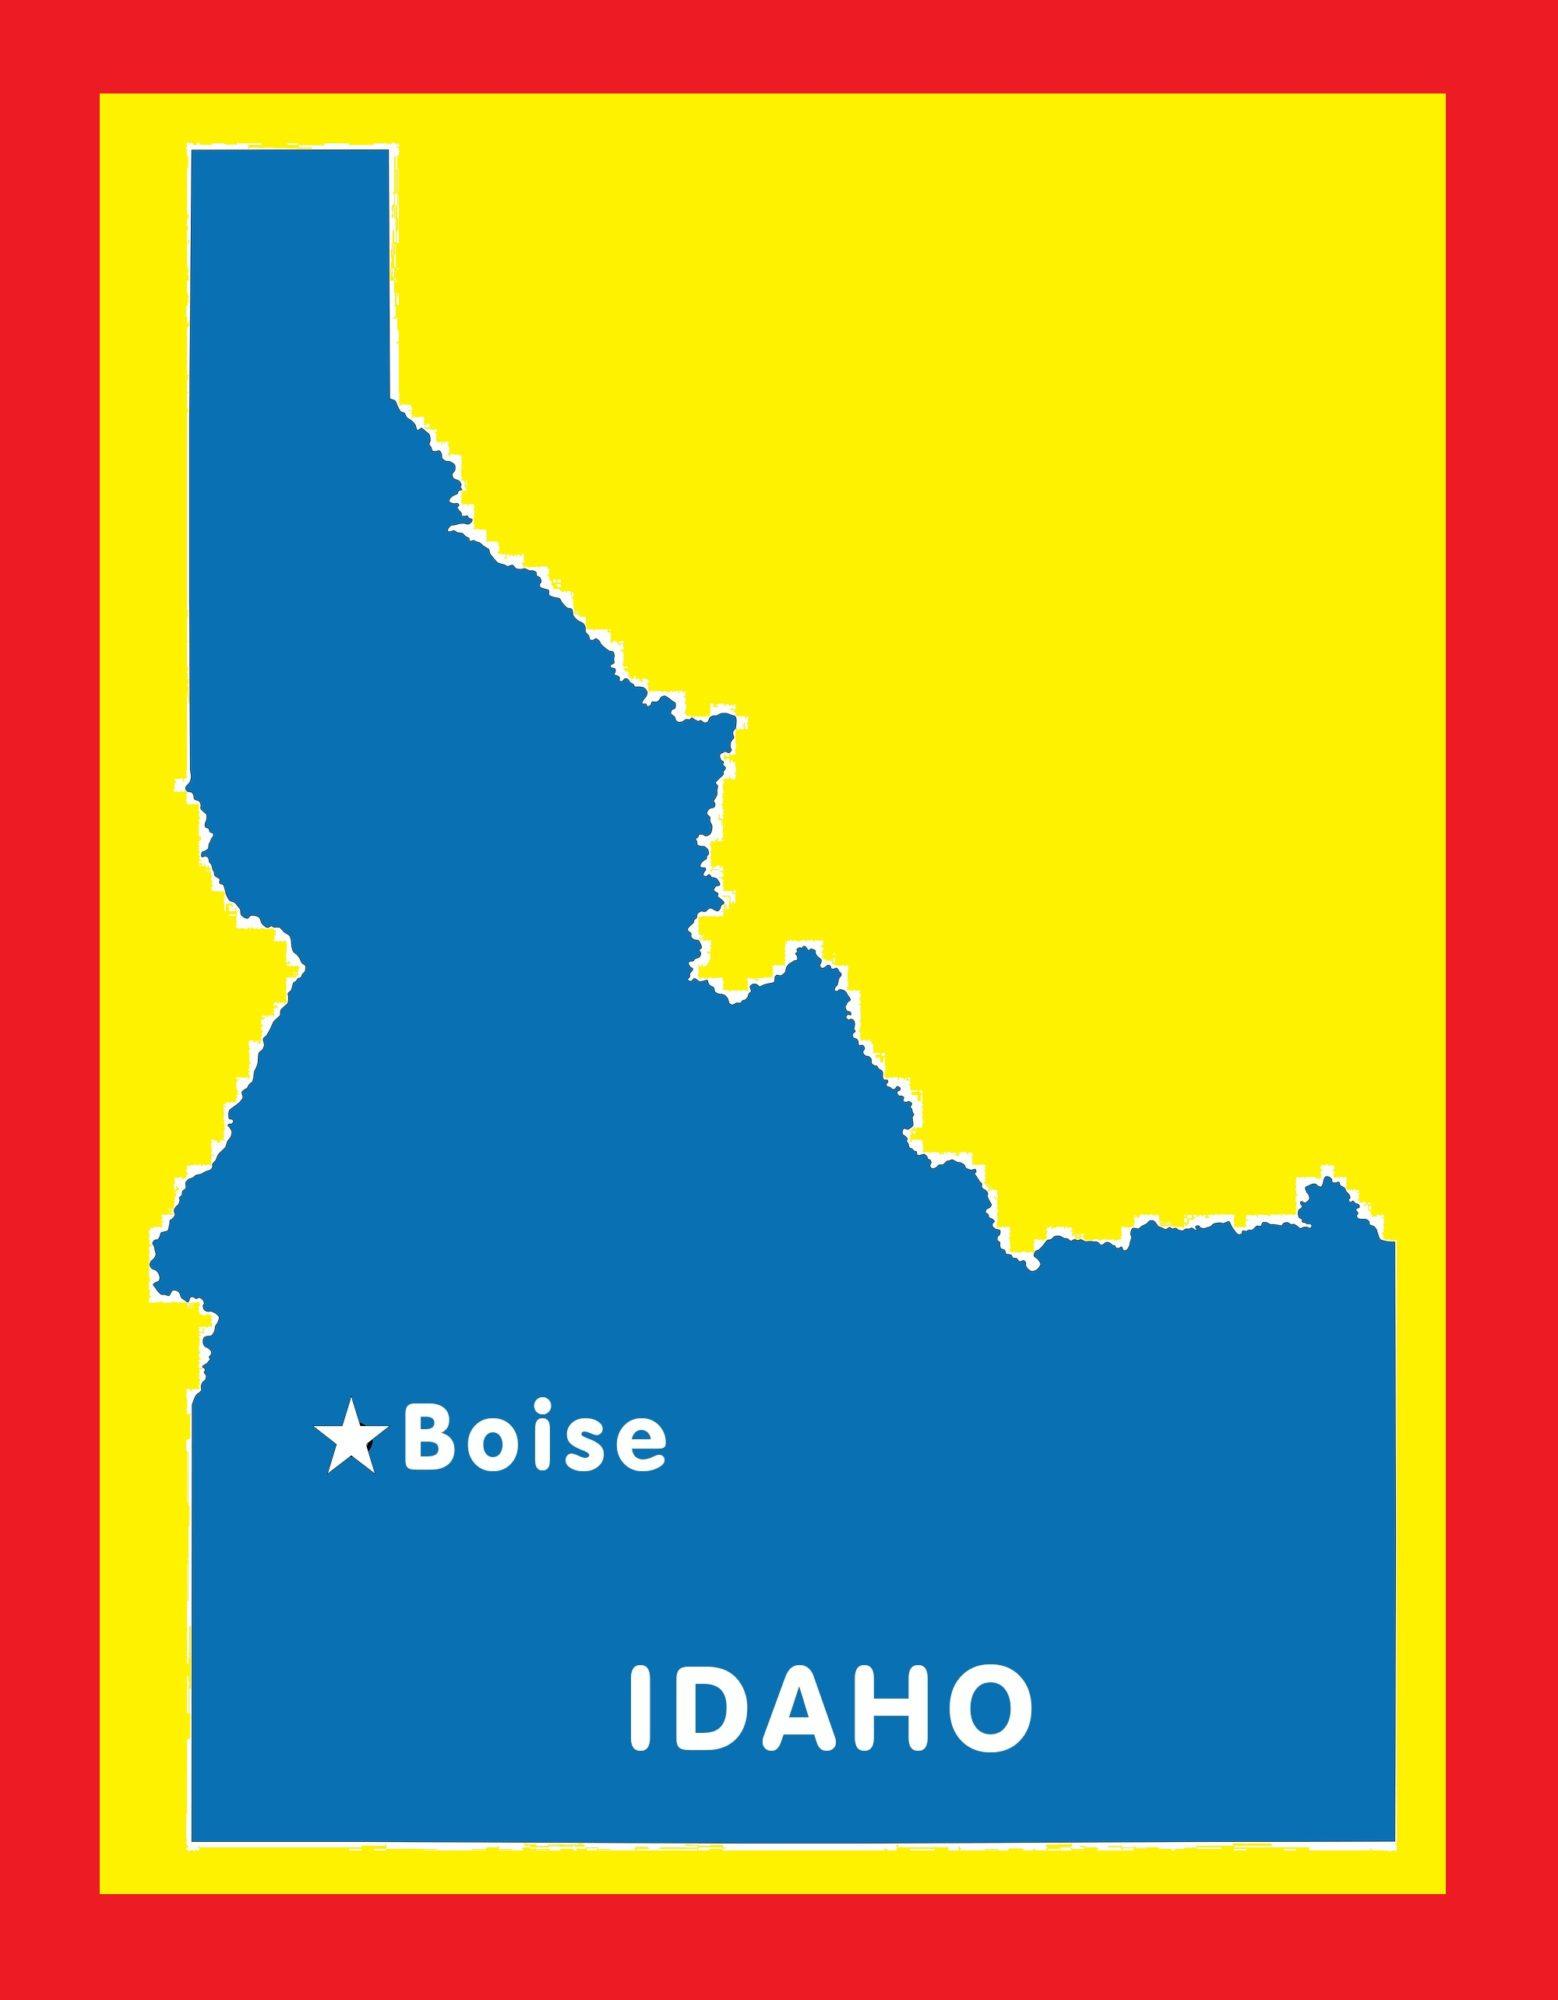 Idaho Capital Map   Large Printable and Standard Map 9